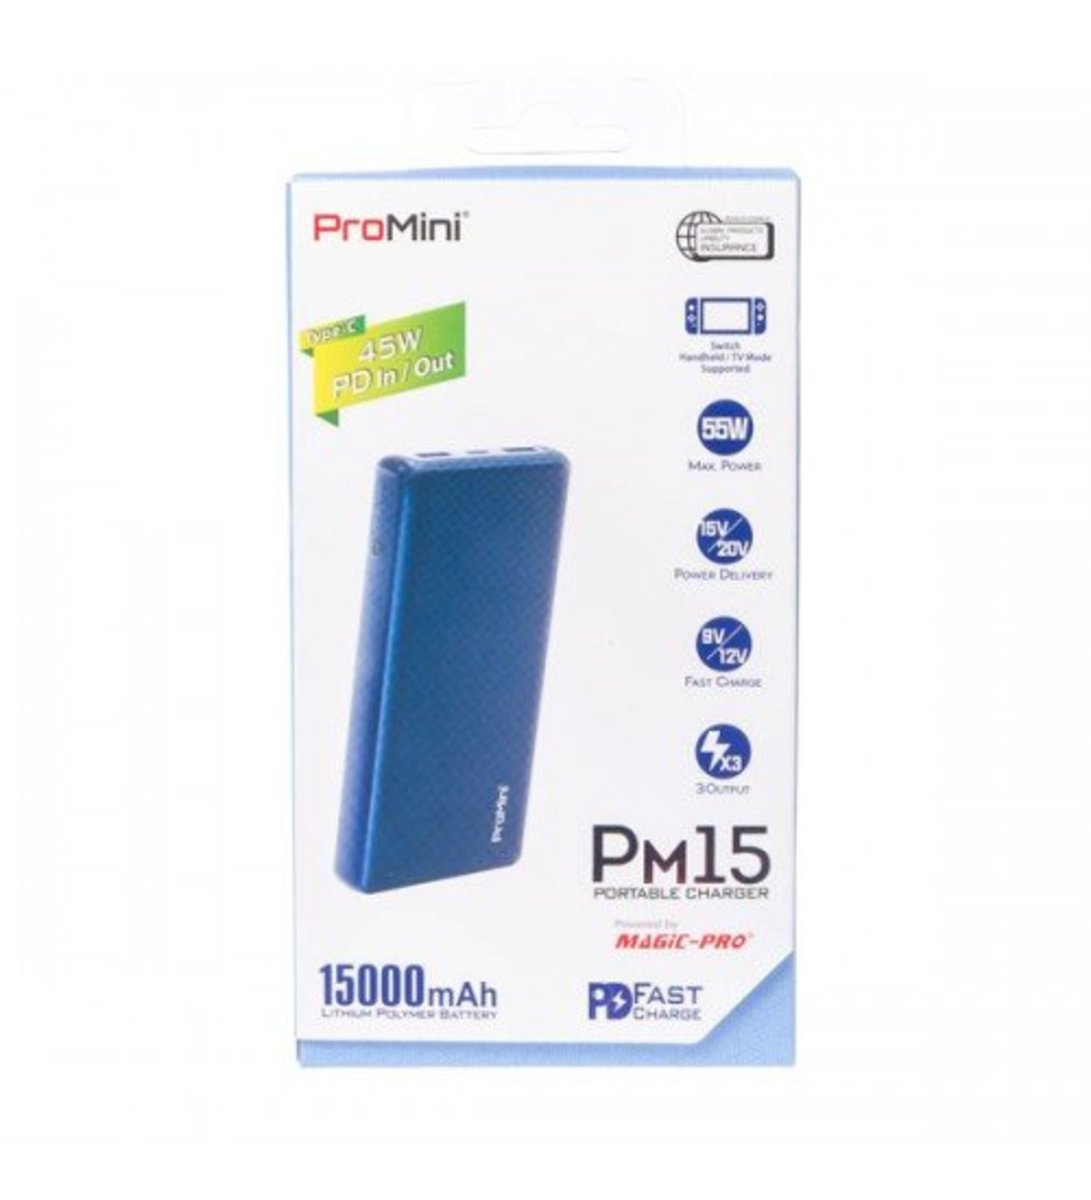 ProMini PM15 PD 快速充電流動電池[藍色]